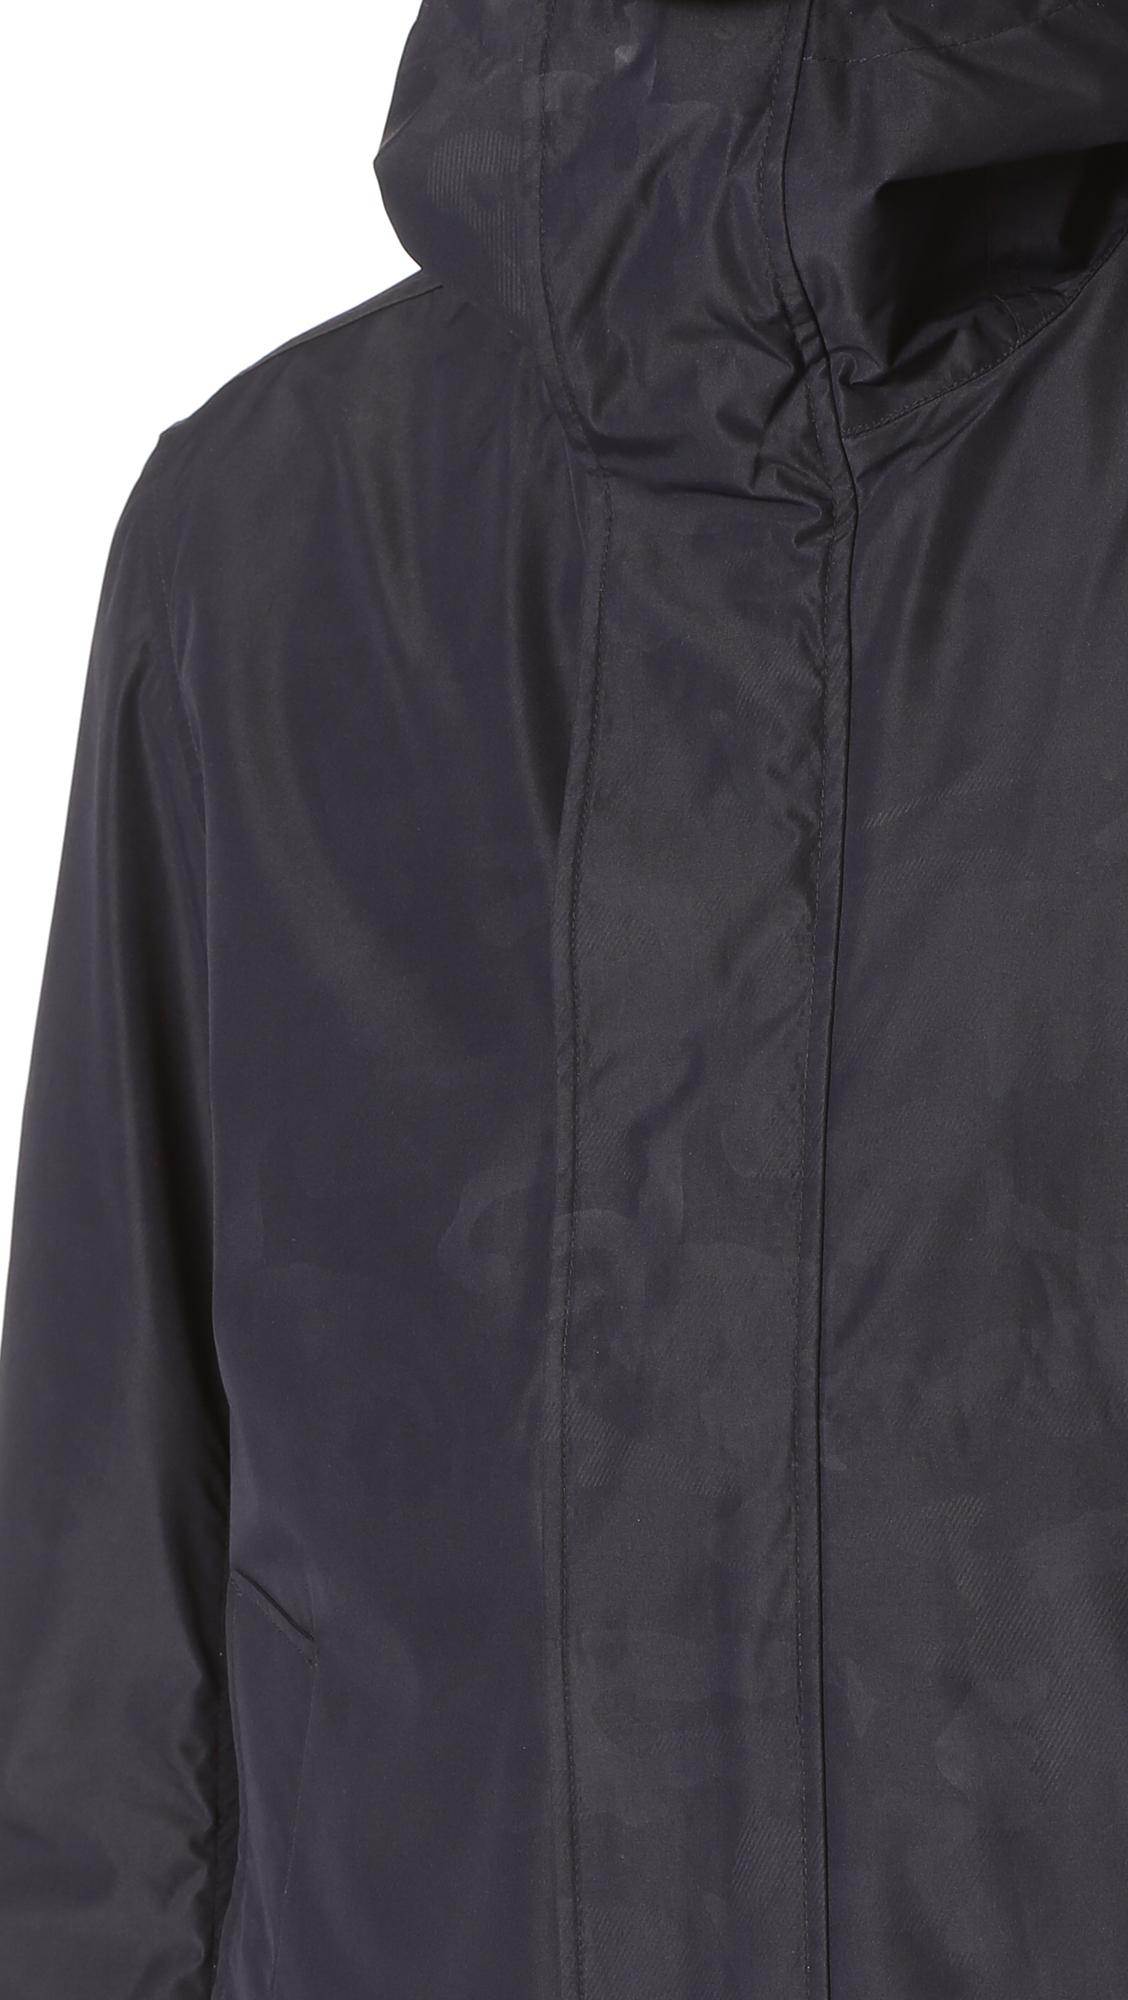 Woolrich John Rich Bros Camouflage Rudder Jacket East Dane Hugo Boss Endrio Hitam